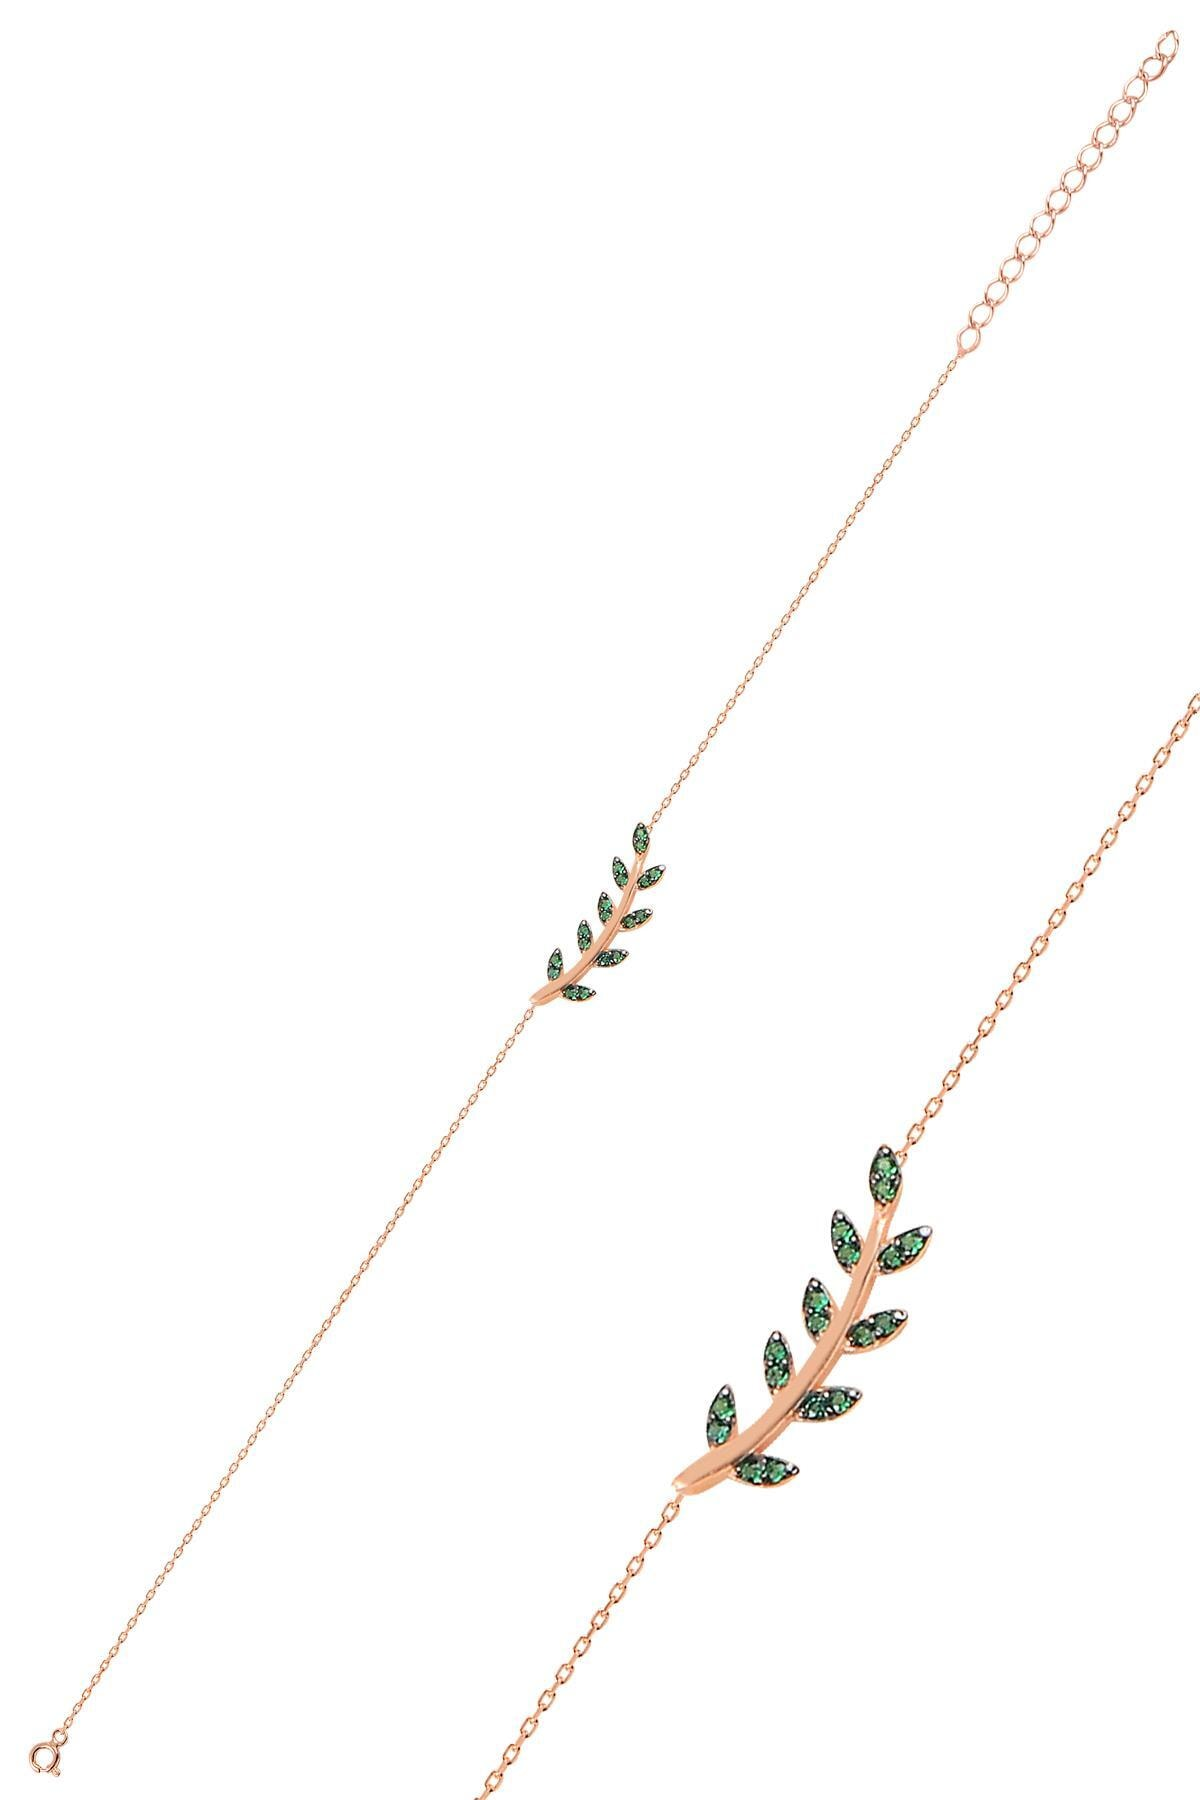 Söğütlü Silver Gümüş rose yeşil  taşlı yaprak  üçlü set 2